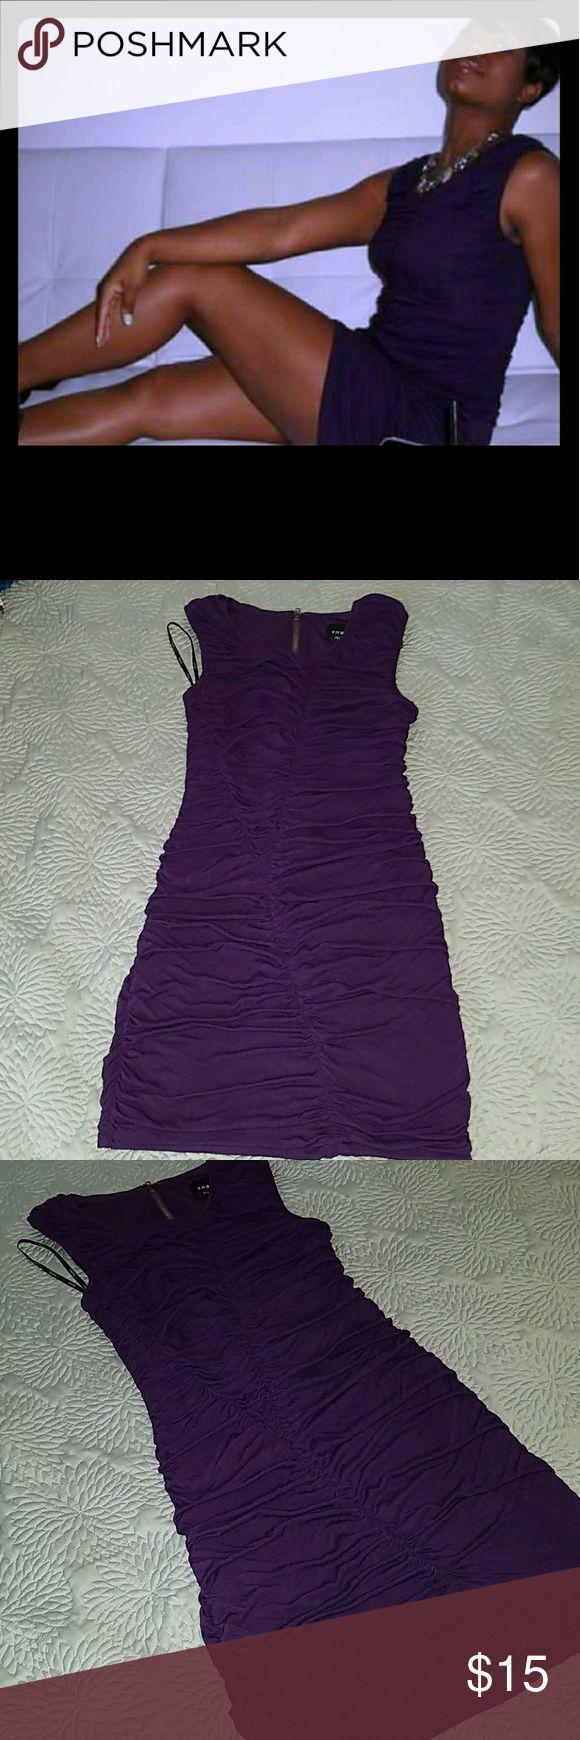 Very sexy purple mini dress! Size medium Very sexy purple mini dress! Size medium Dresses Mini